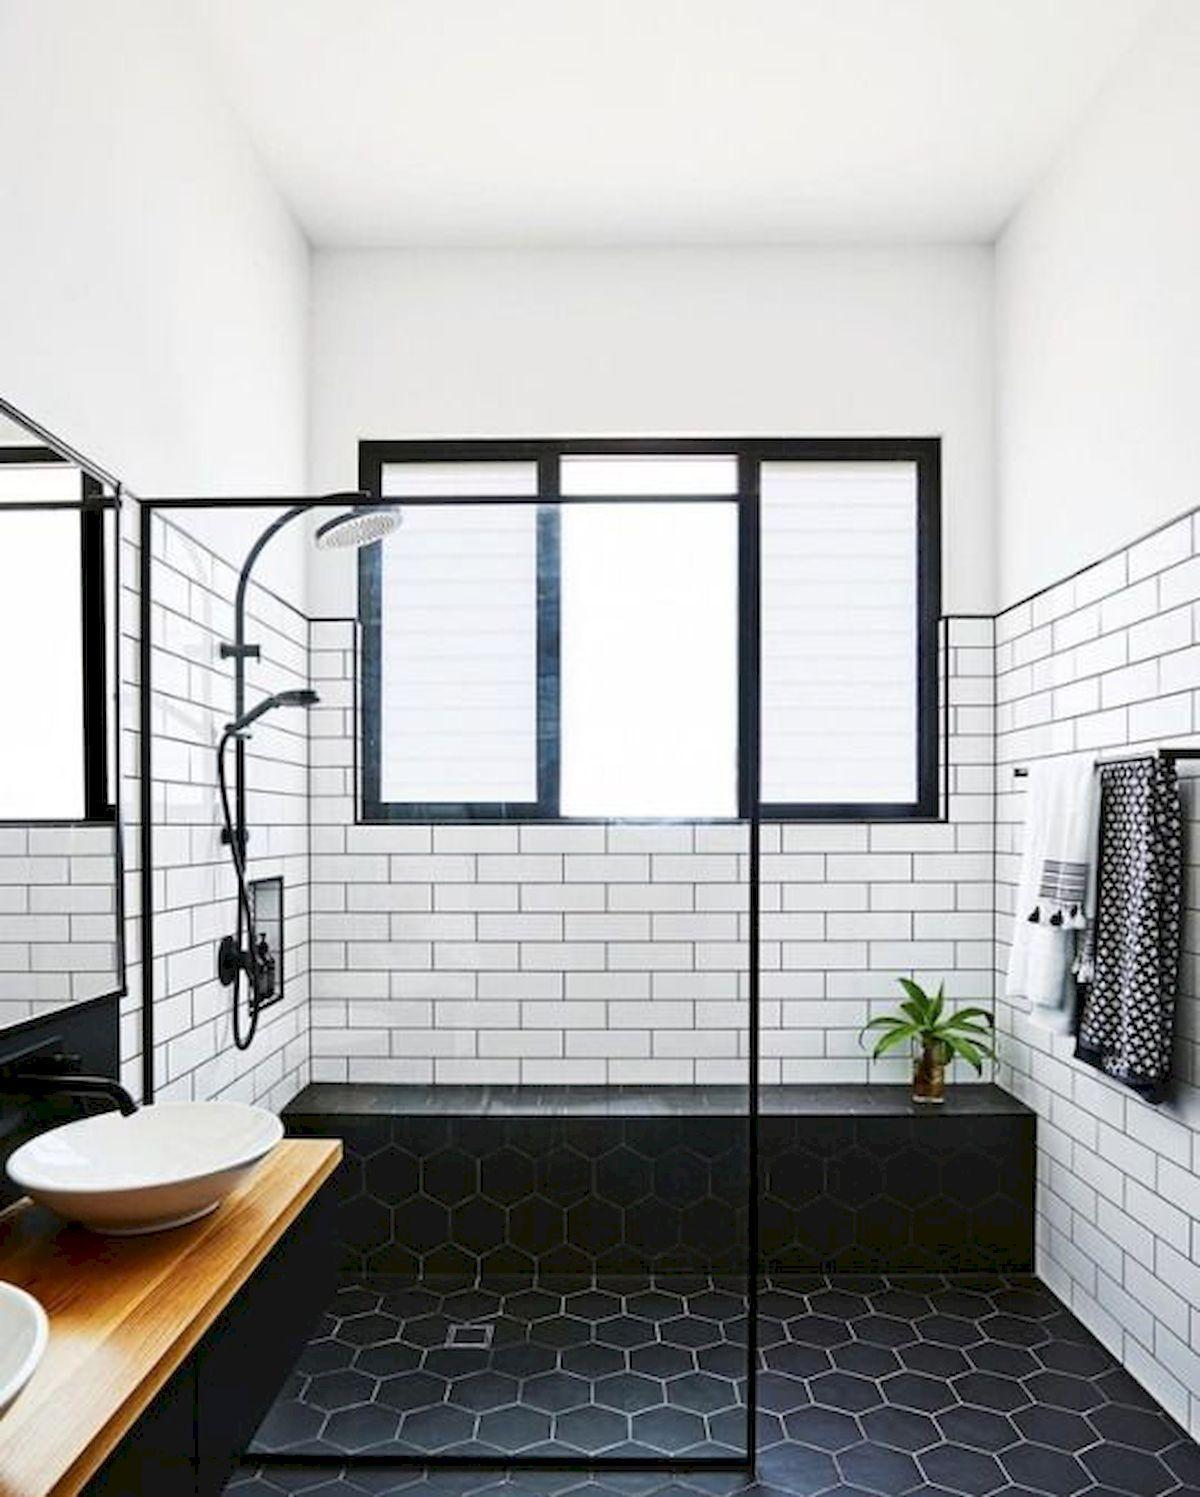 5 x 4 badezimmerdesigns  elegant small master bathroom remodel ideas  bathroom ideas